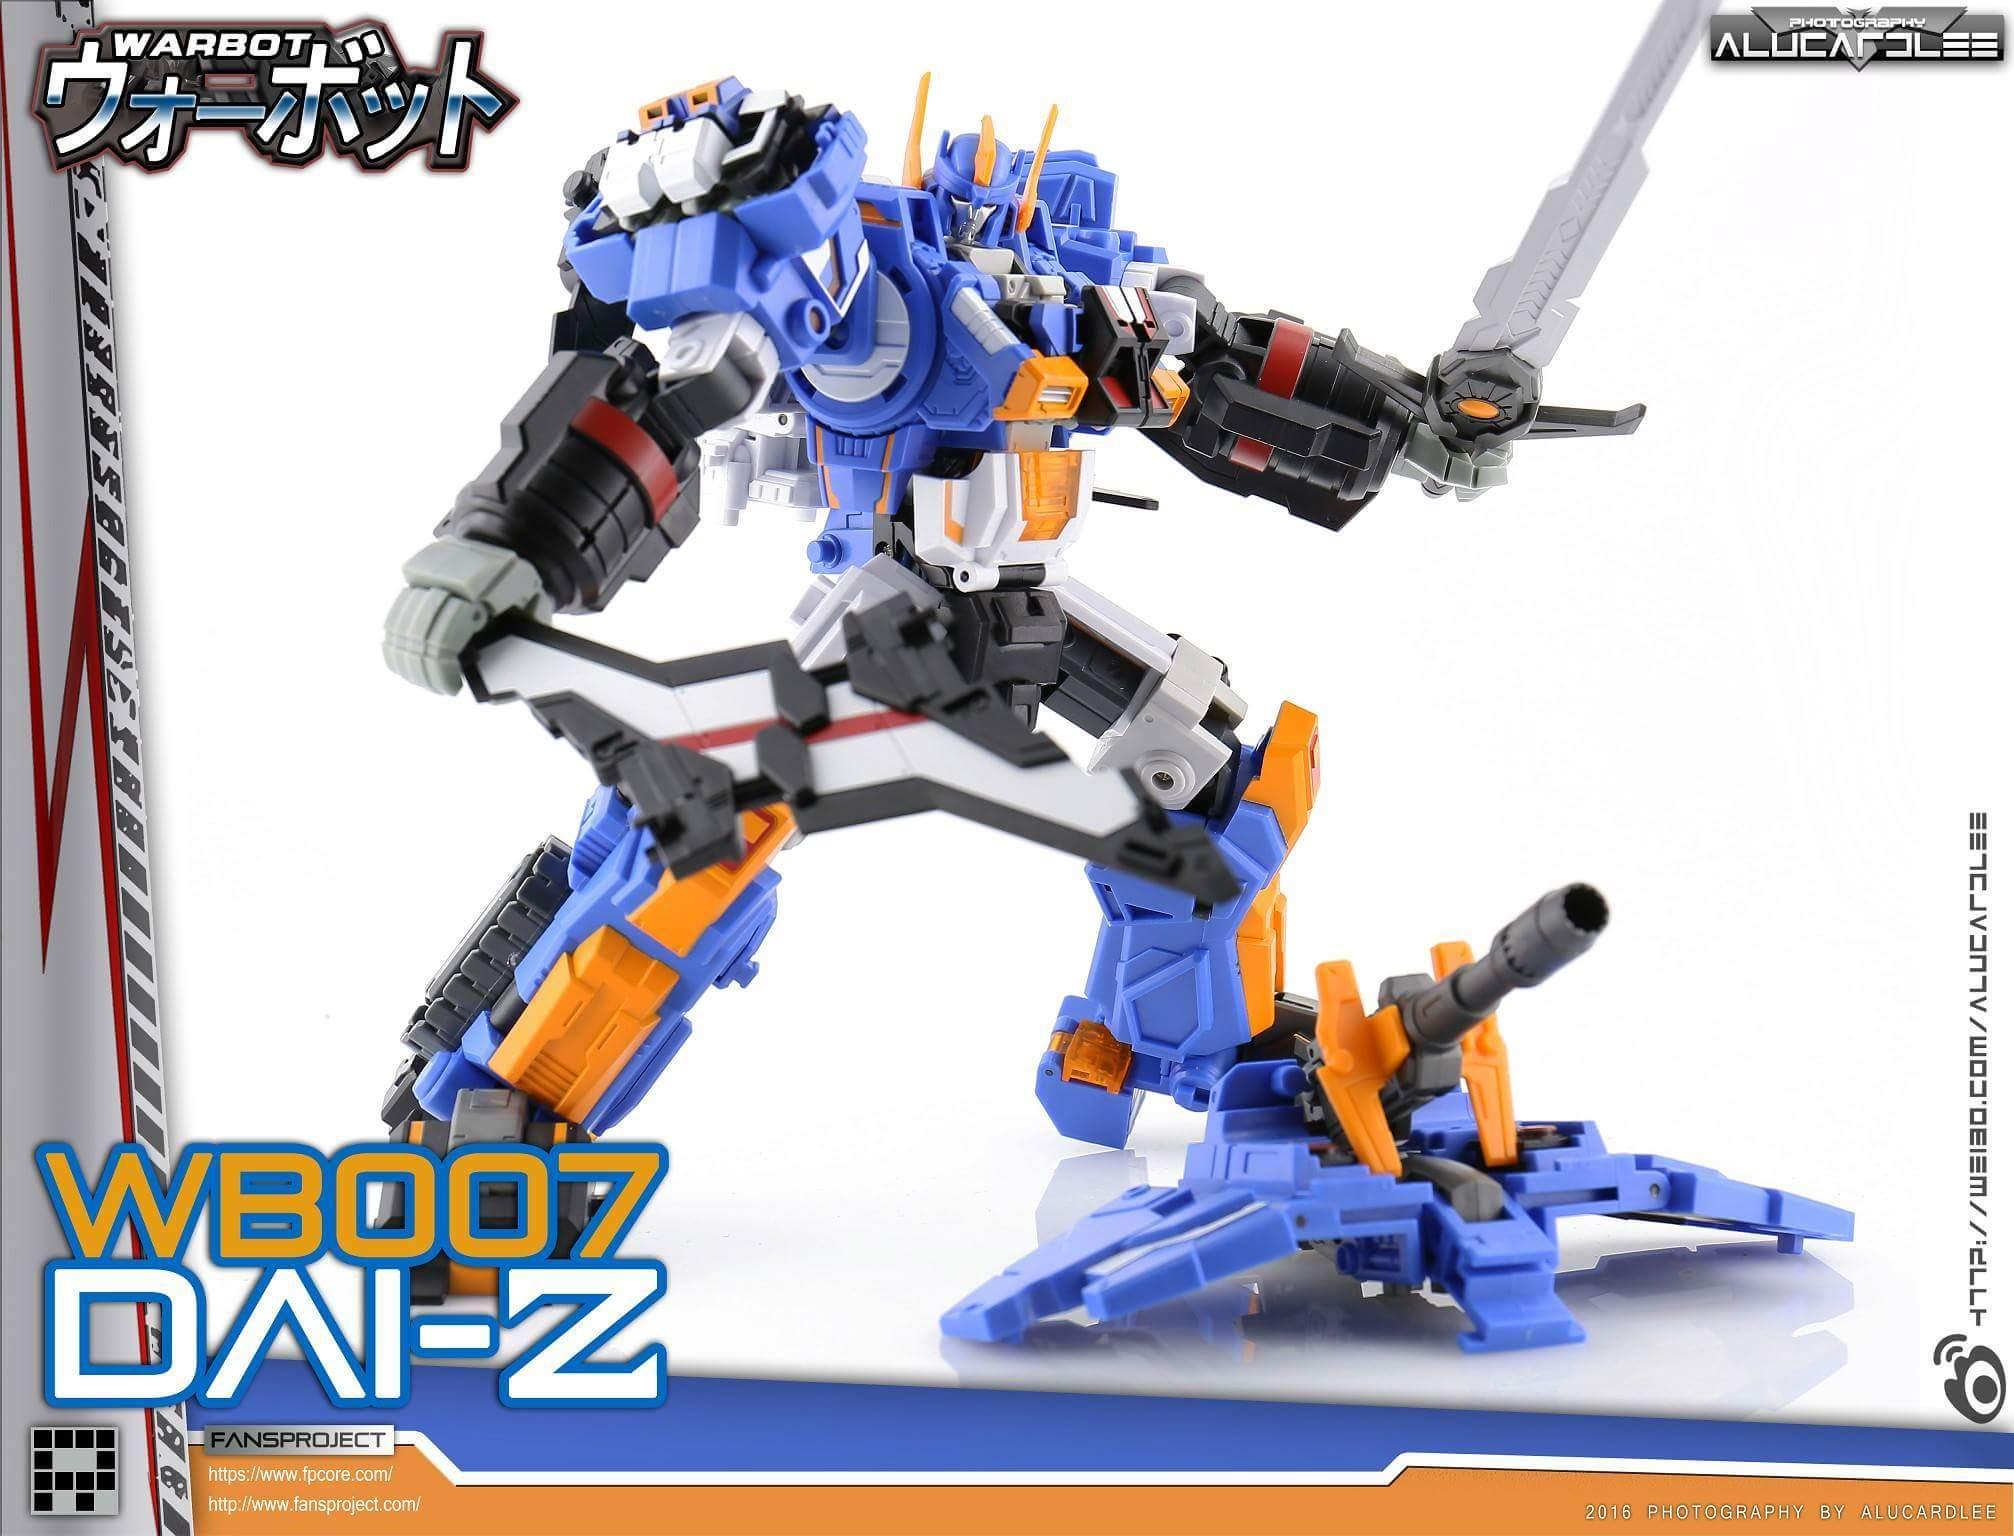 [Fansproject] Produit Tiers - Jouet WB-007 Dai-Z - aka Dai Atlas (Transformers Zone) Vn0iOpVA